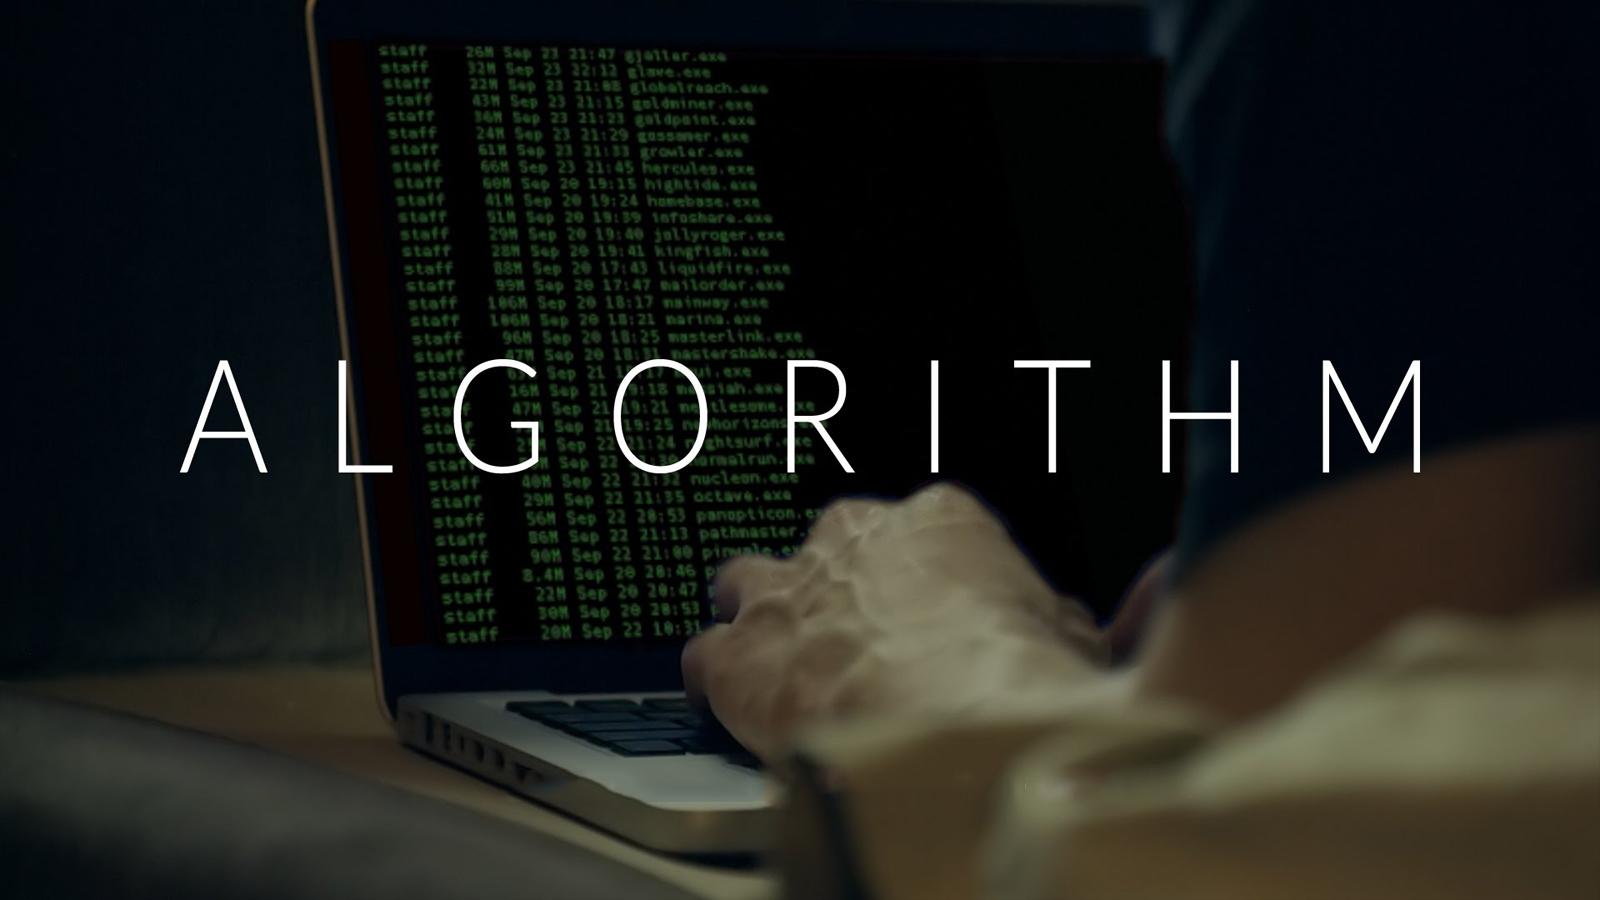 Algorithm - The Hacker Movie